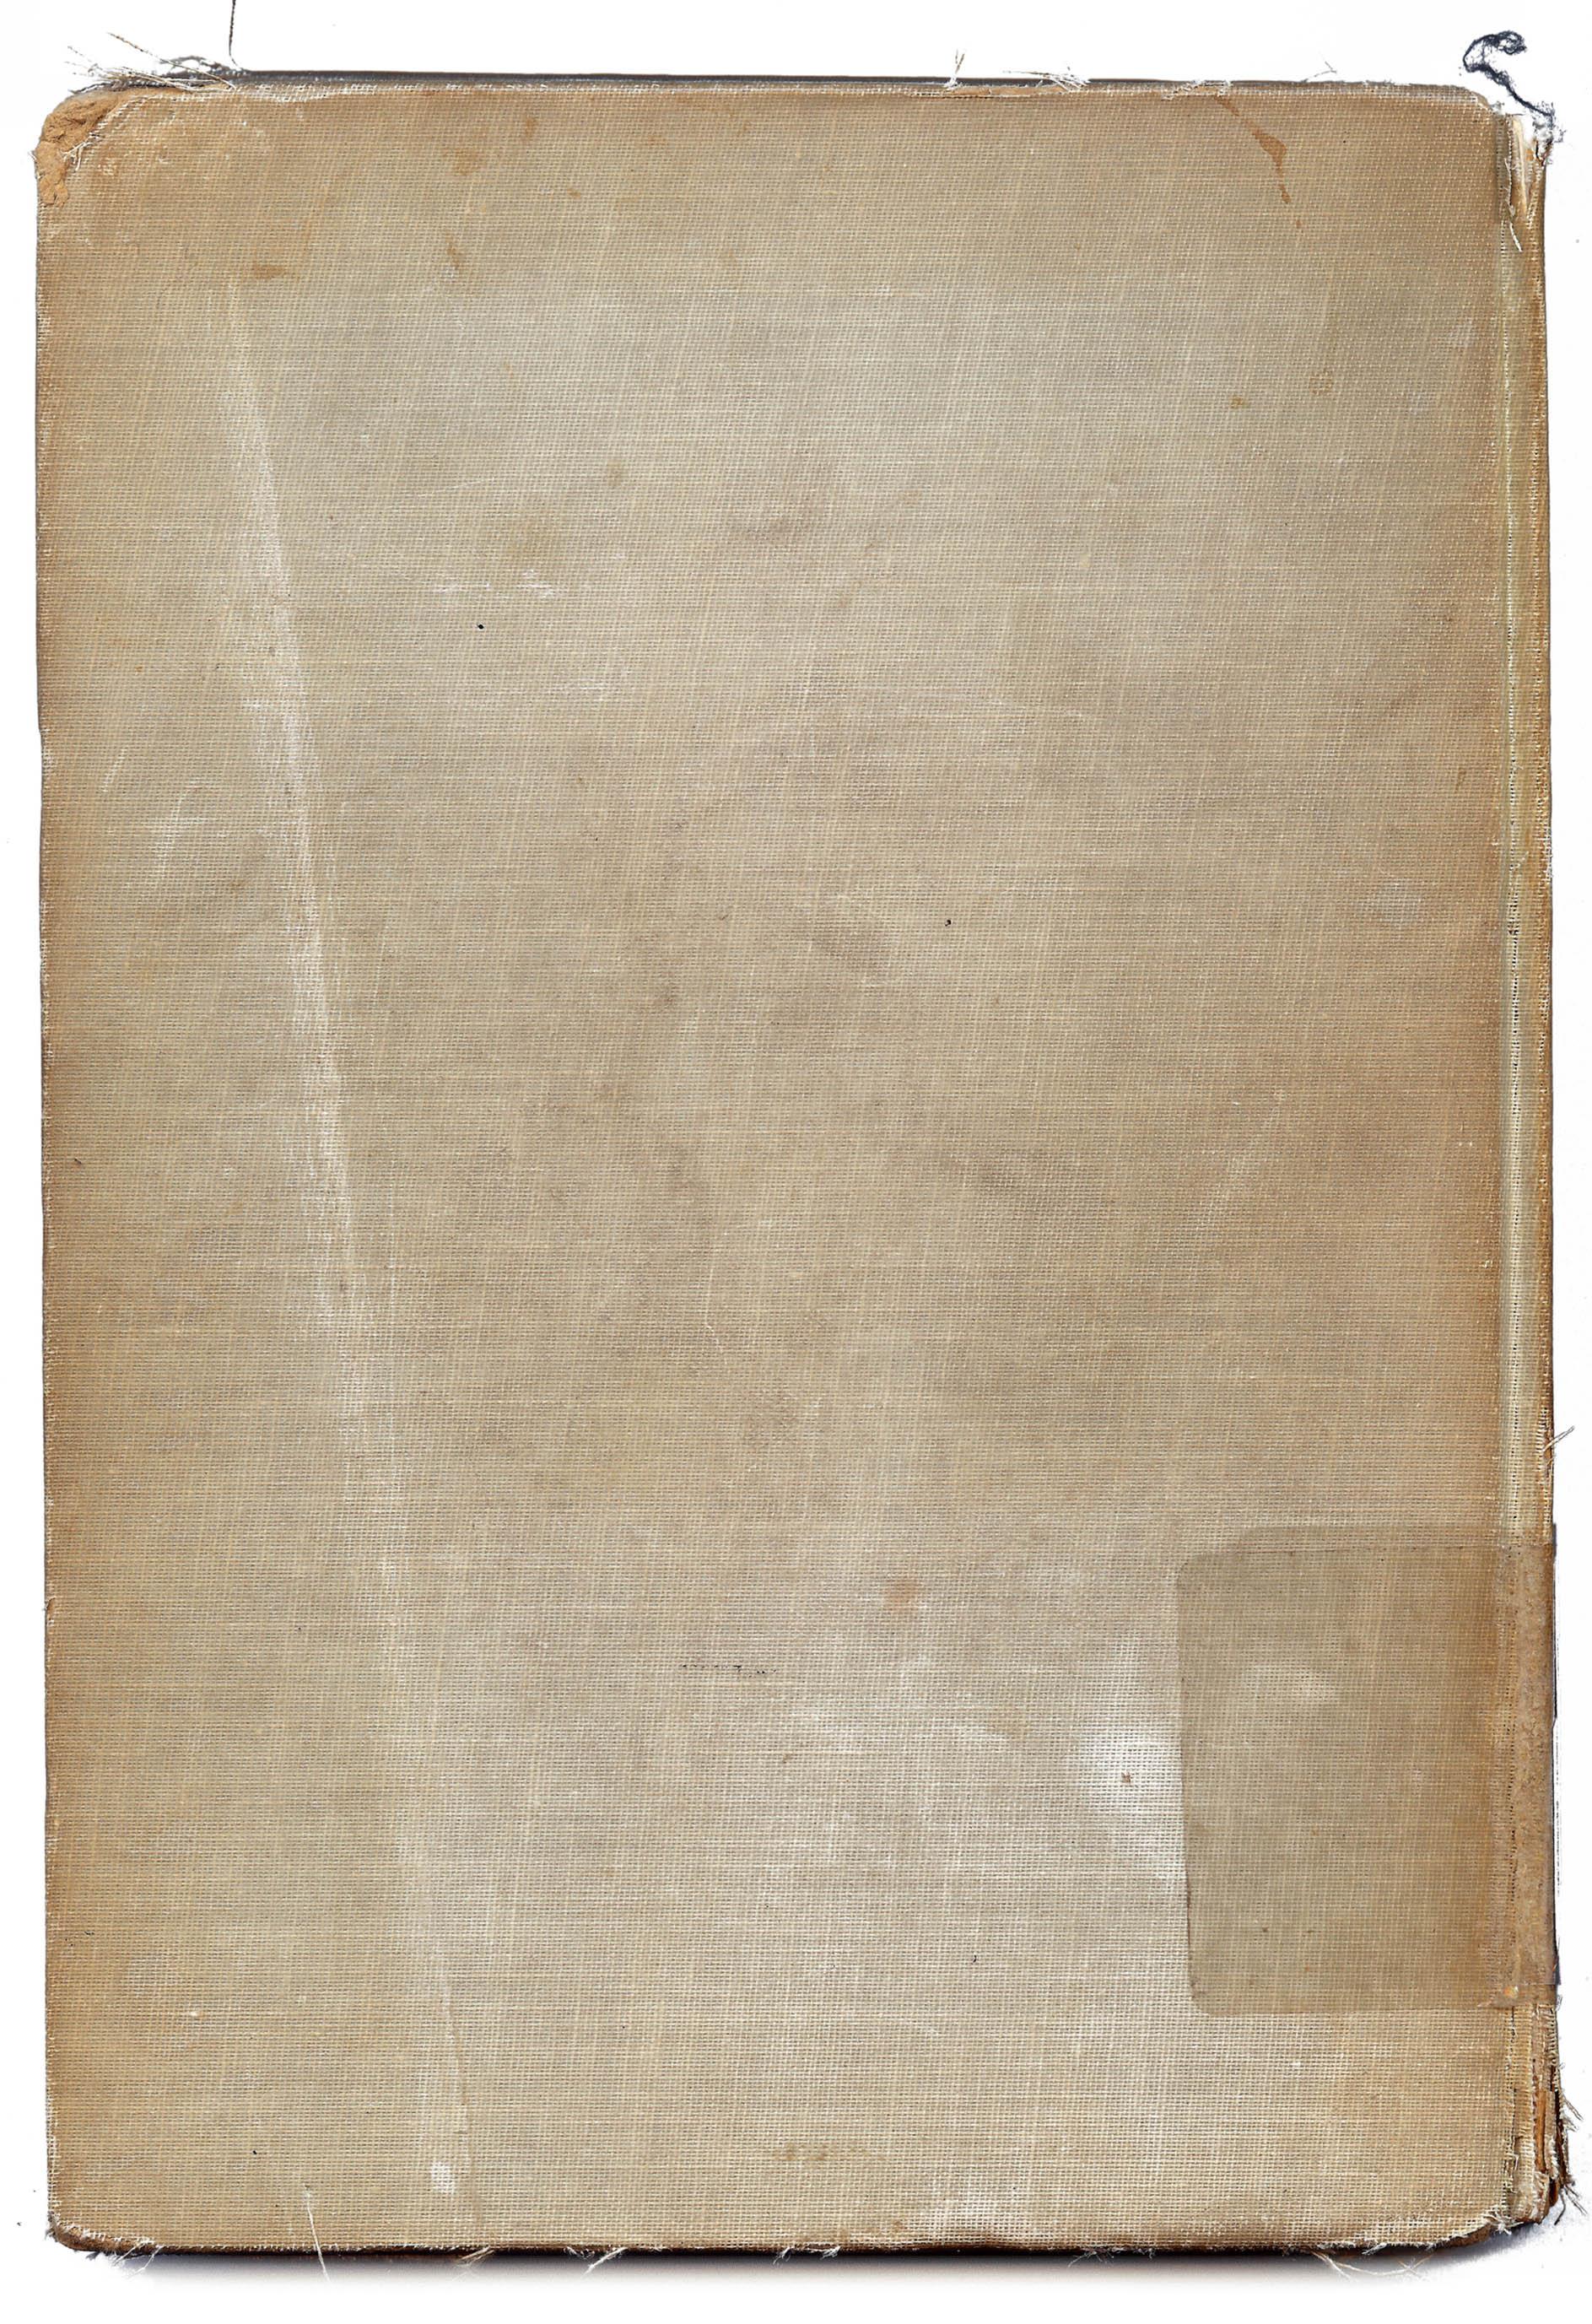 Untld. 103 1887x2754 by pandoraicons